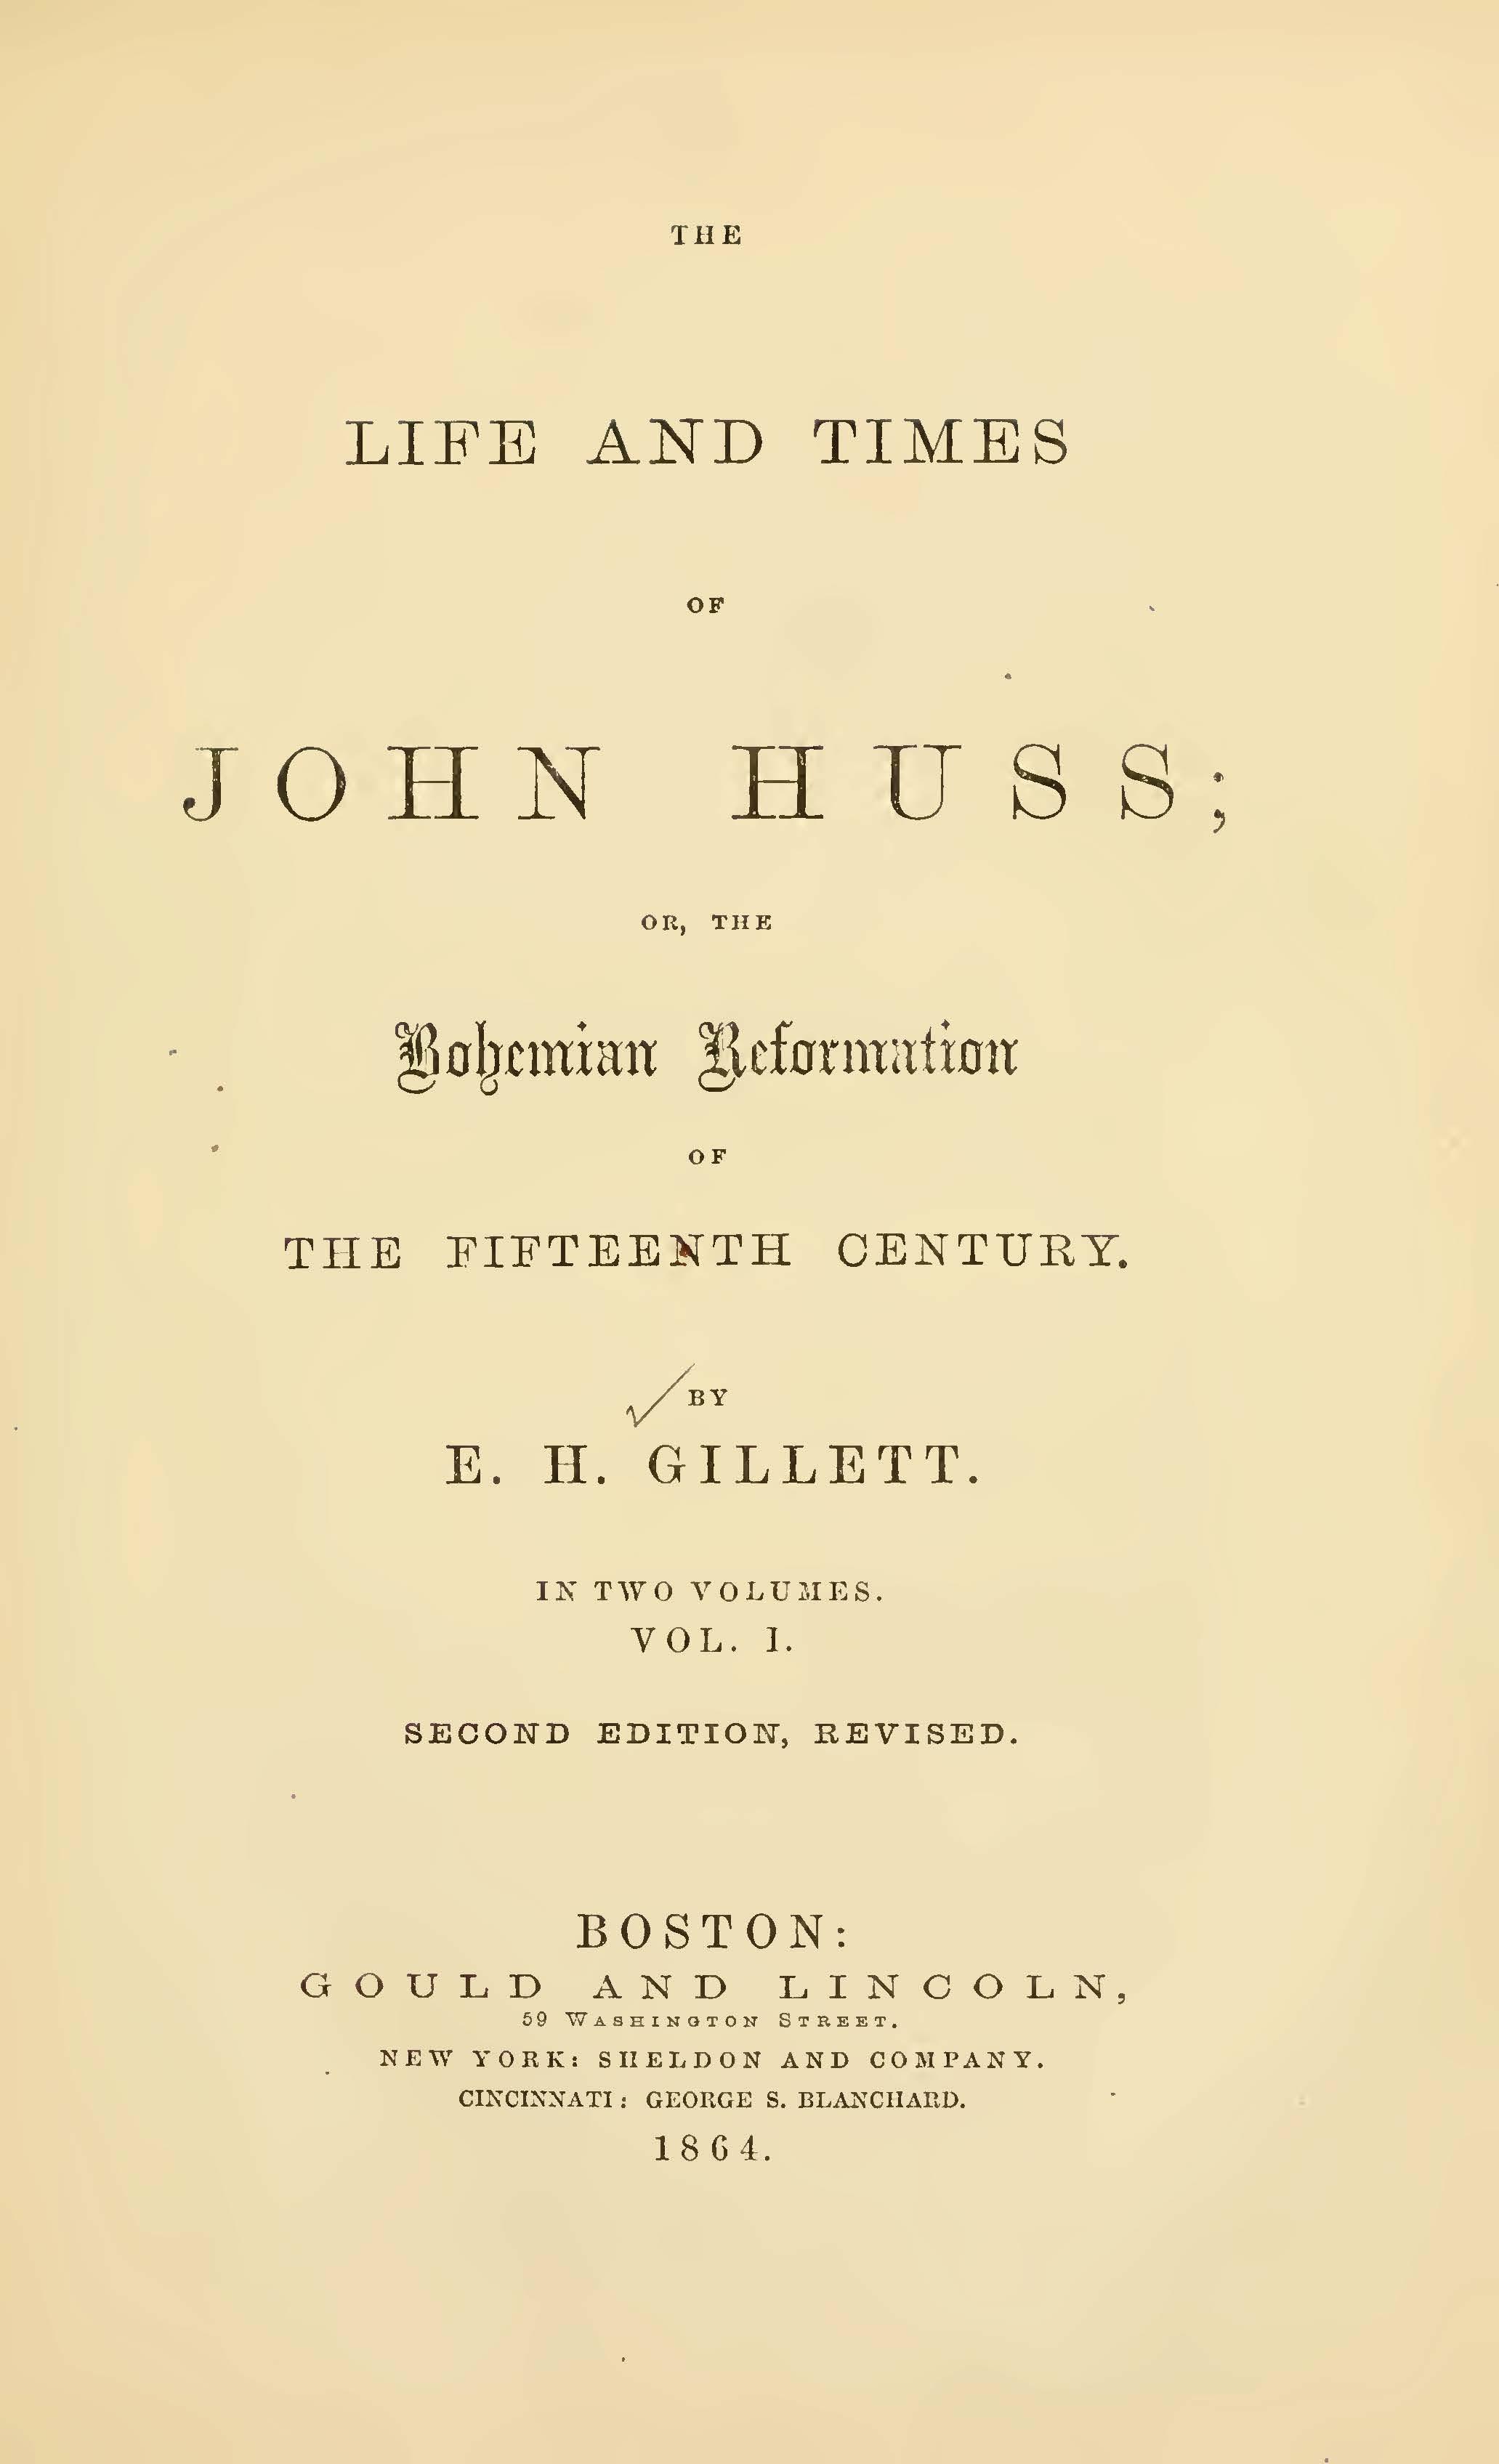 Gillett, Ezra Hall, The Life and Times of John Huss Title Page.jpg